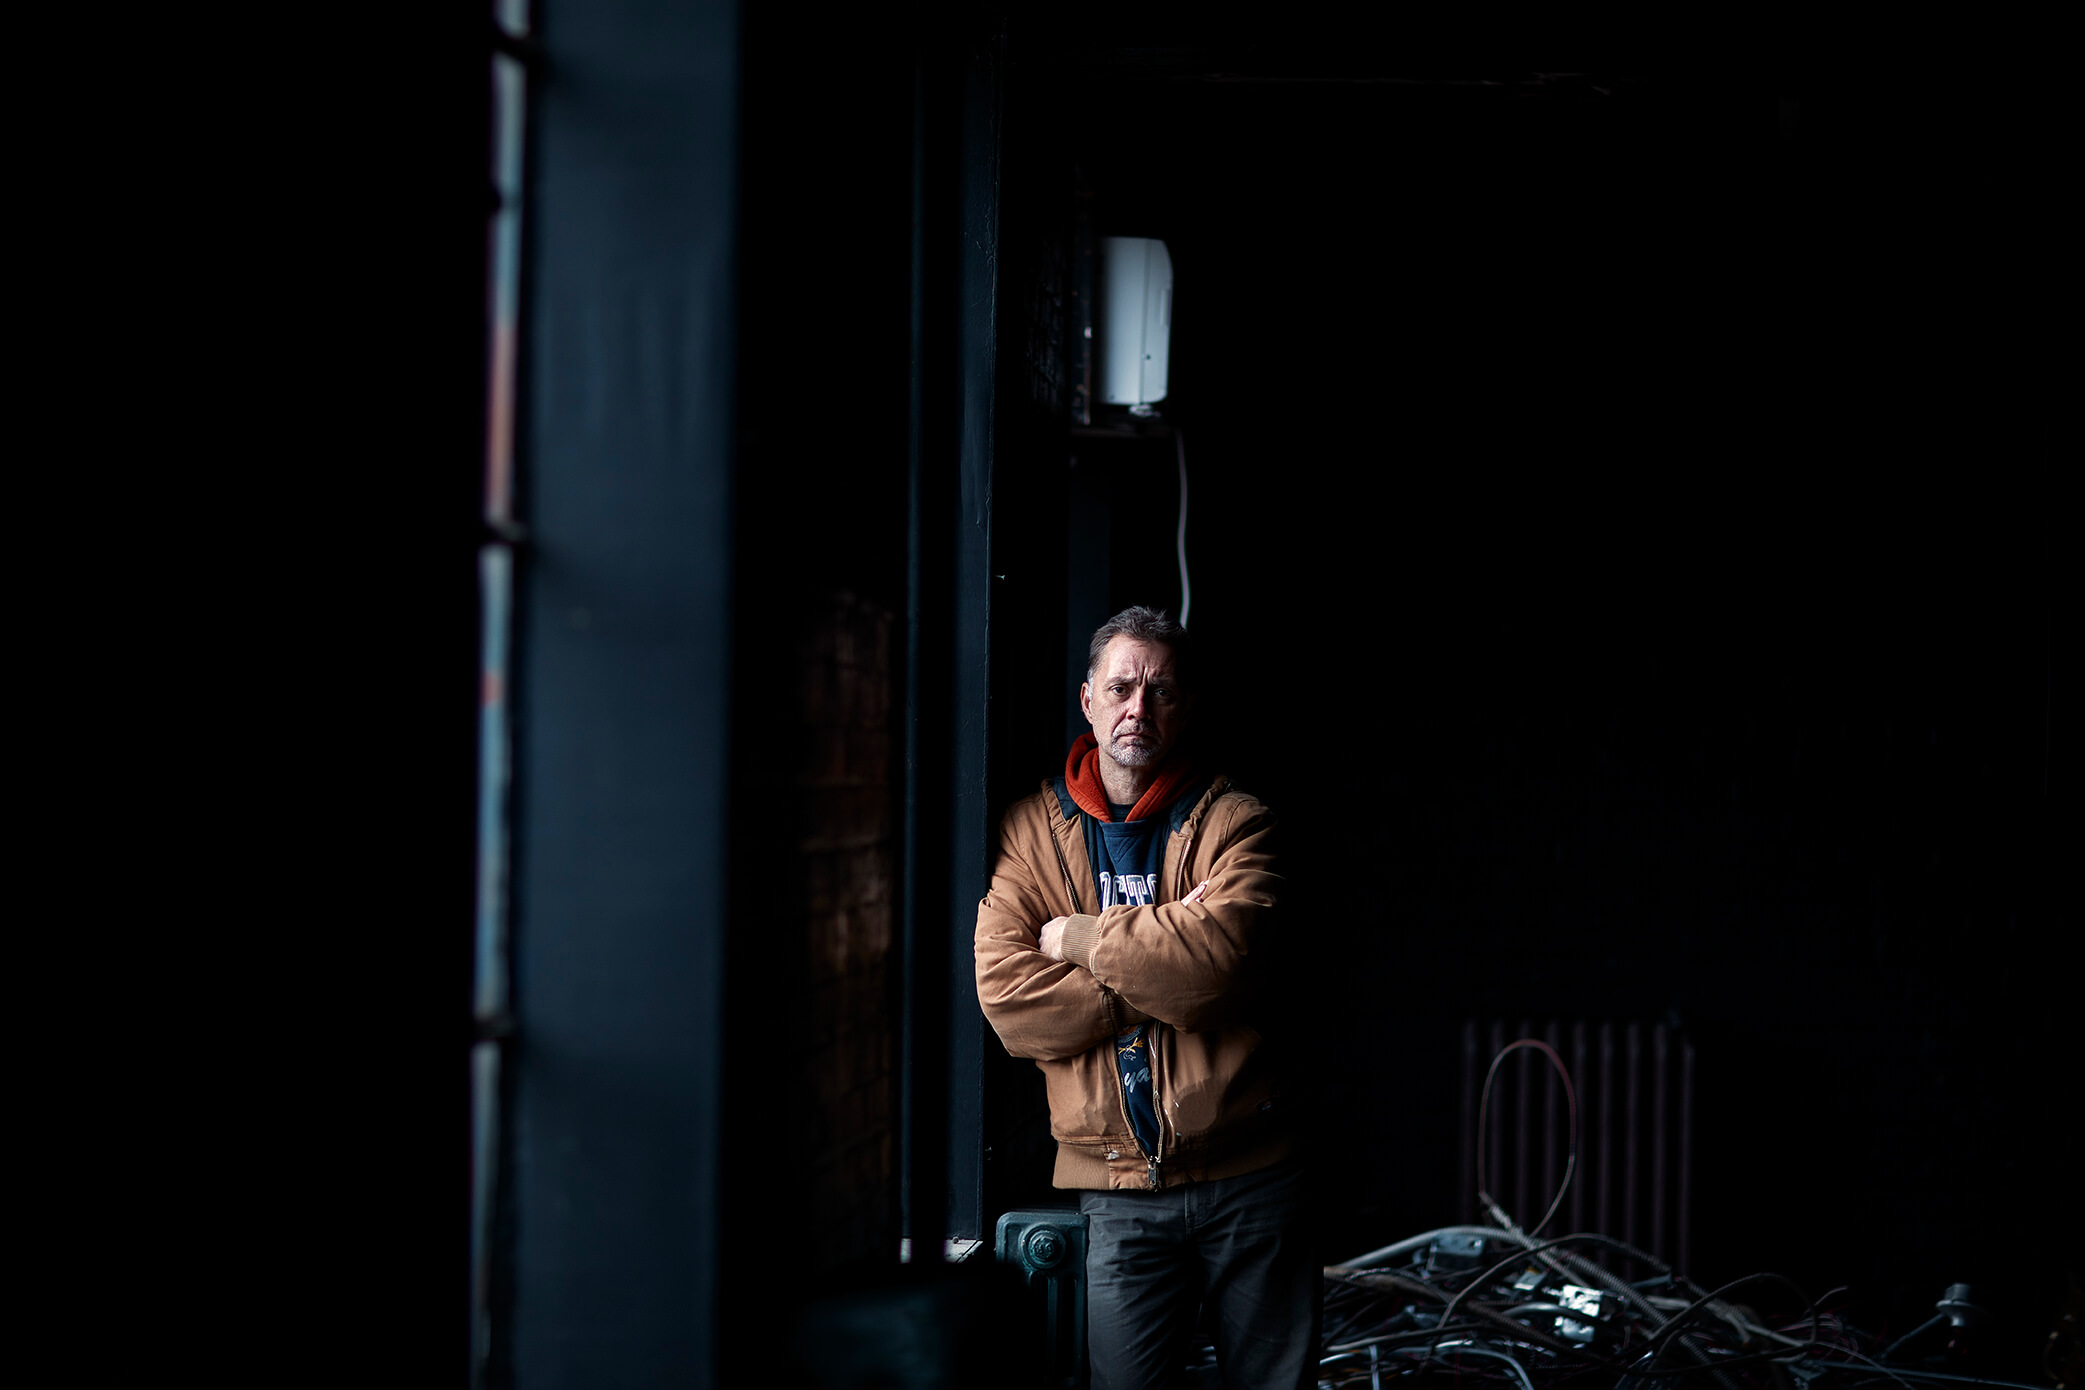 Unified Content, Max Rosenstein, portrait, portrait photography, toronto photography, toronto advertising, toronto production, production, production in toronto, toronto production companies, annex hotel, toronto hotels, toronto building, toronto construction,